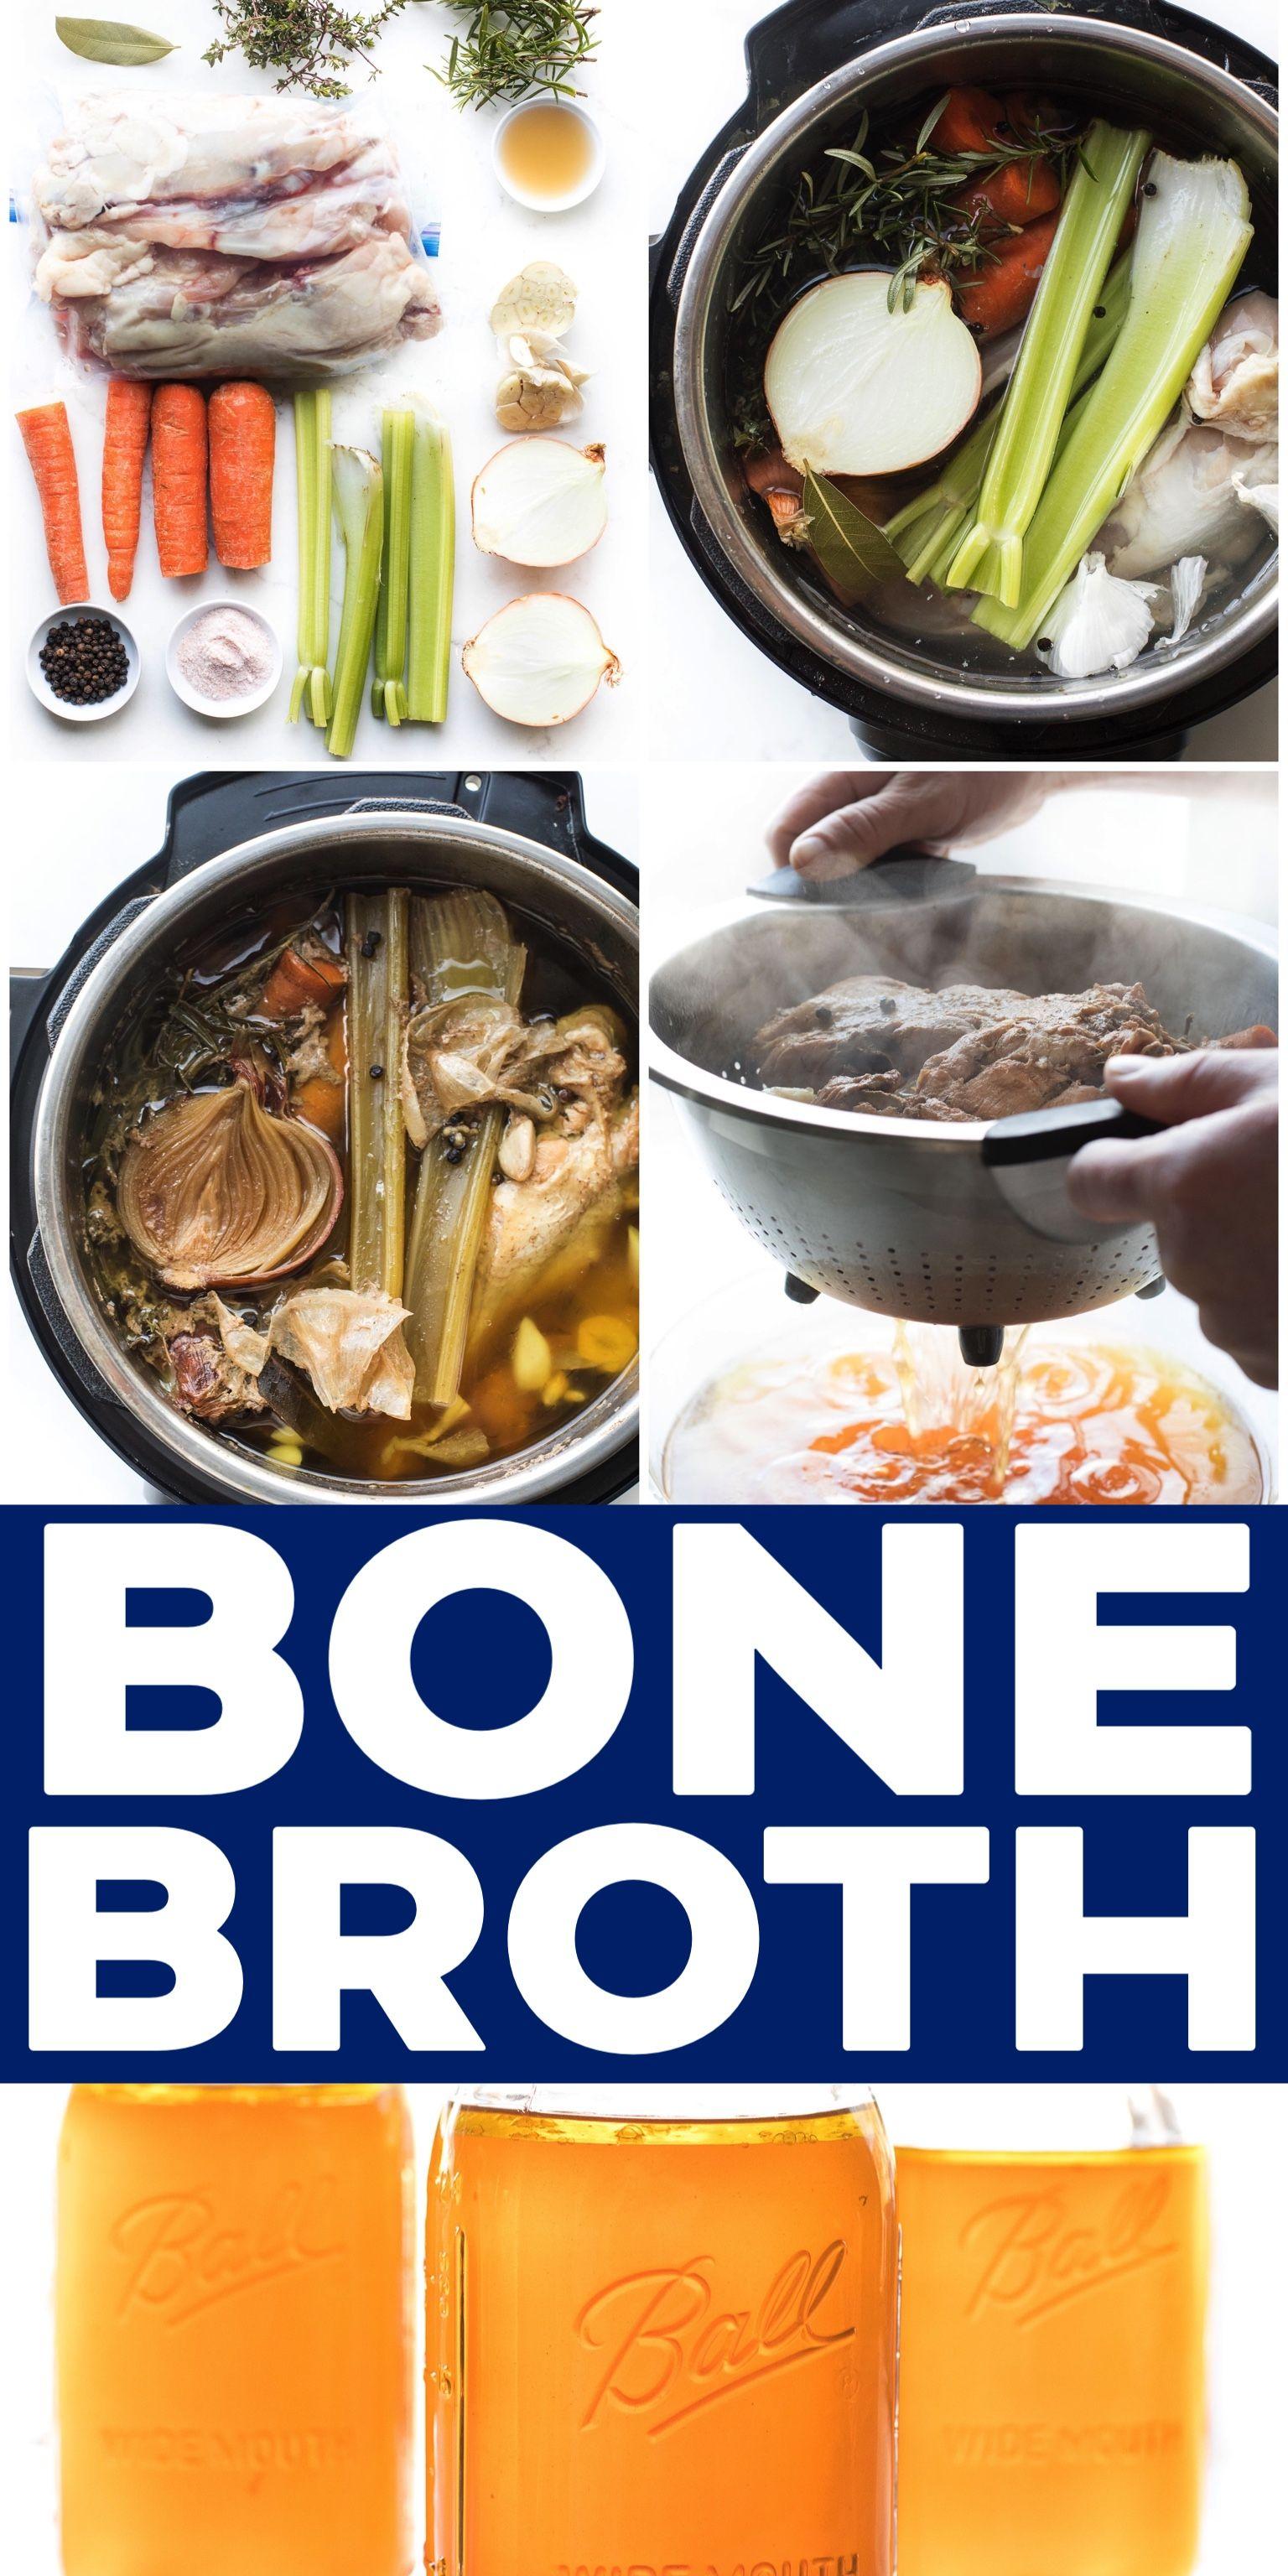 Instant Pot Chicken Stock Bone Broth (Paleo, Whole30, Keto) #bonebrothrecipe